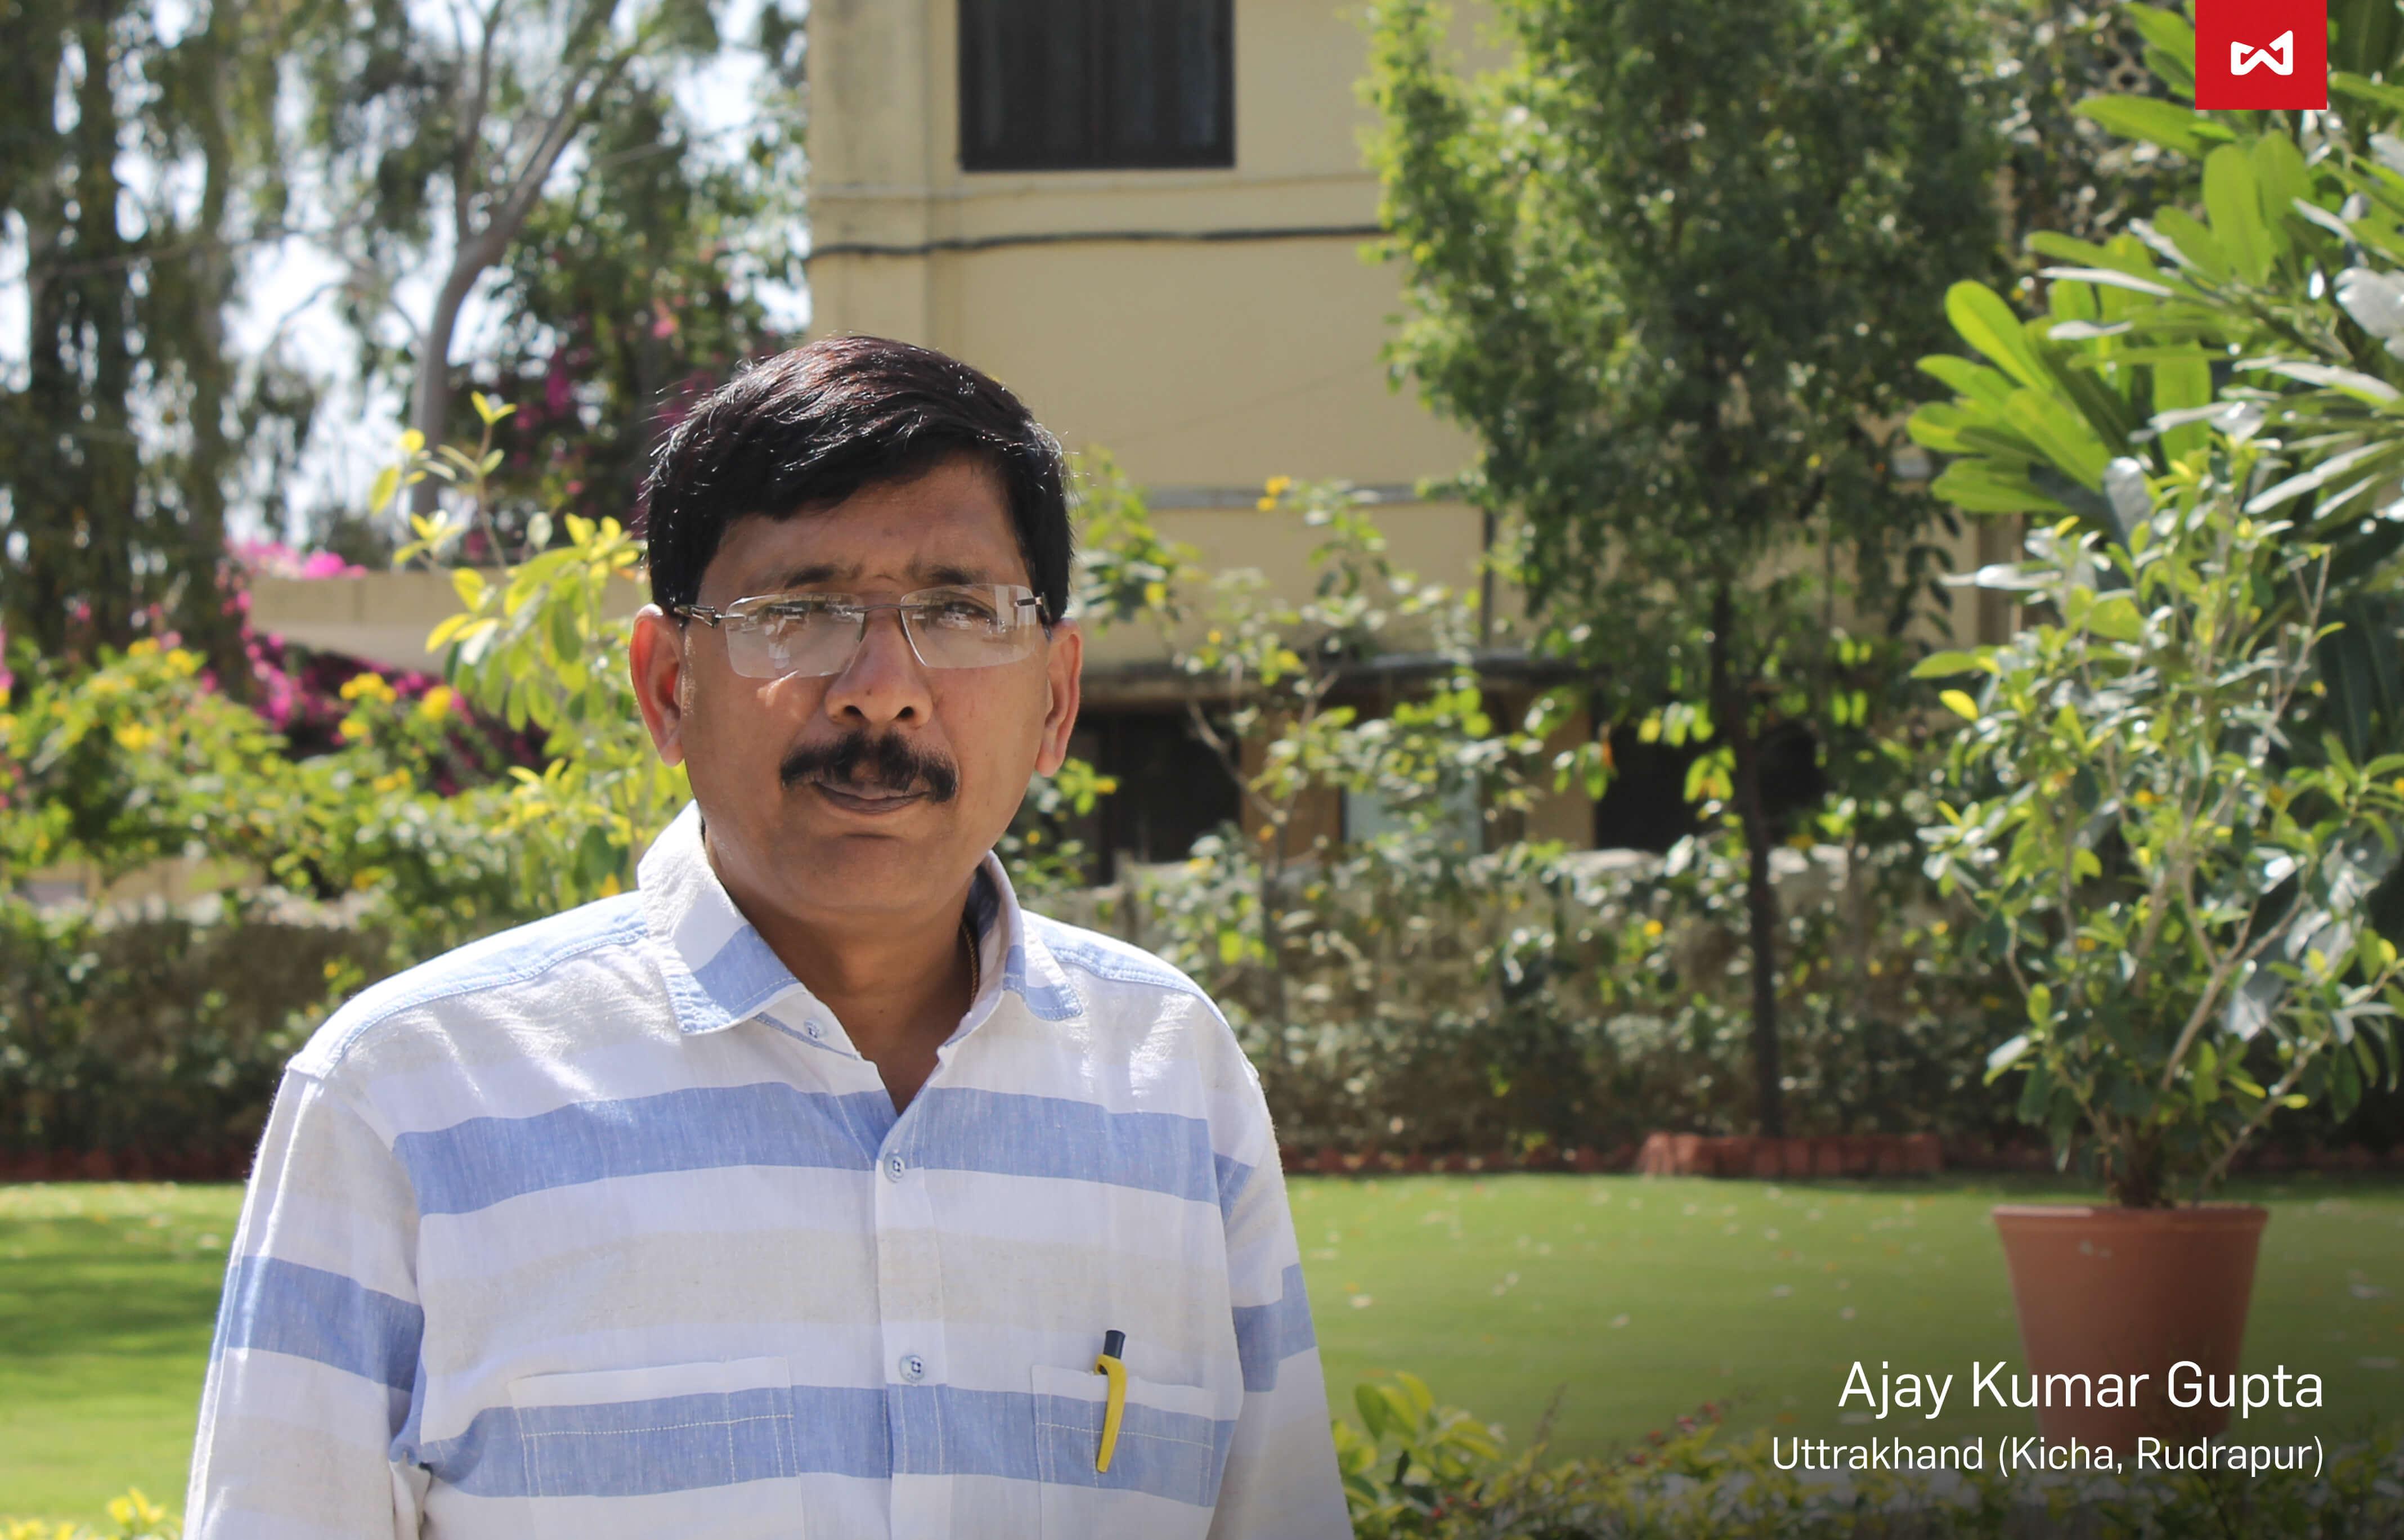 Ajay Kumar Gupta